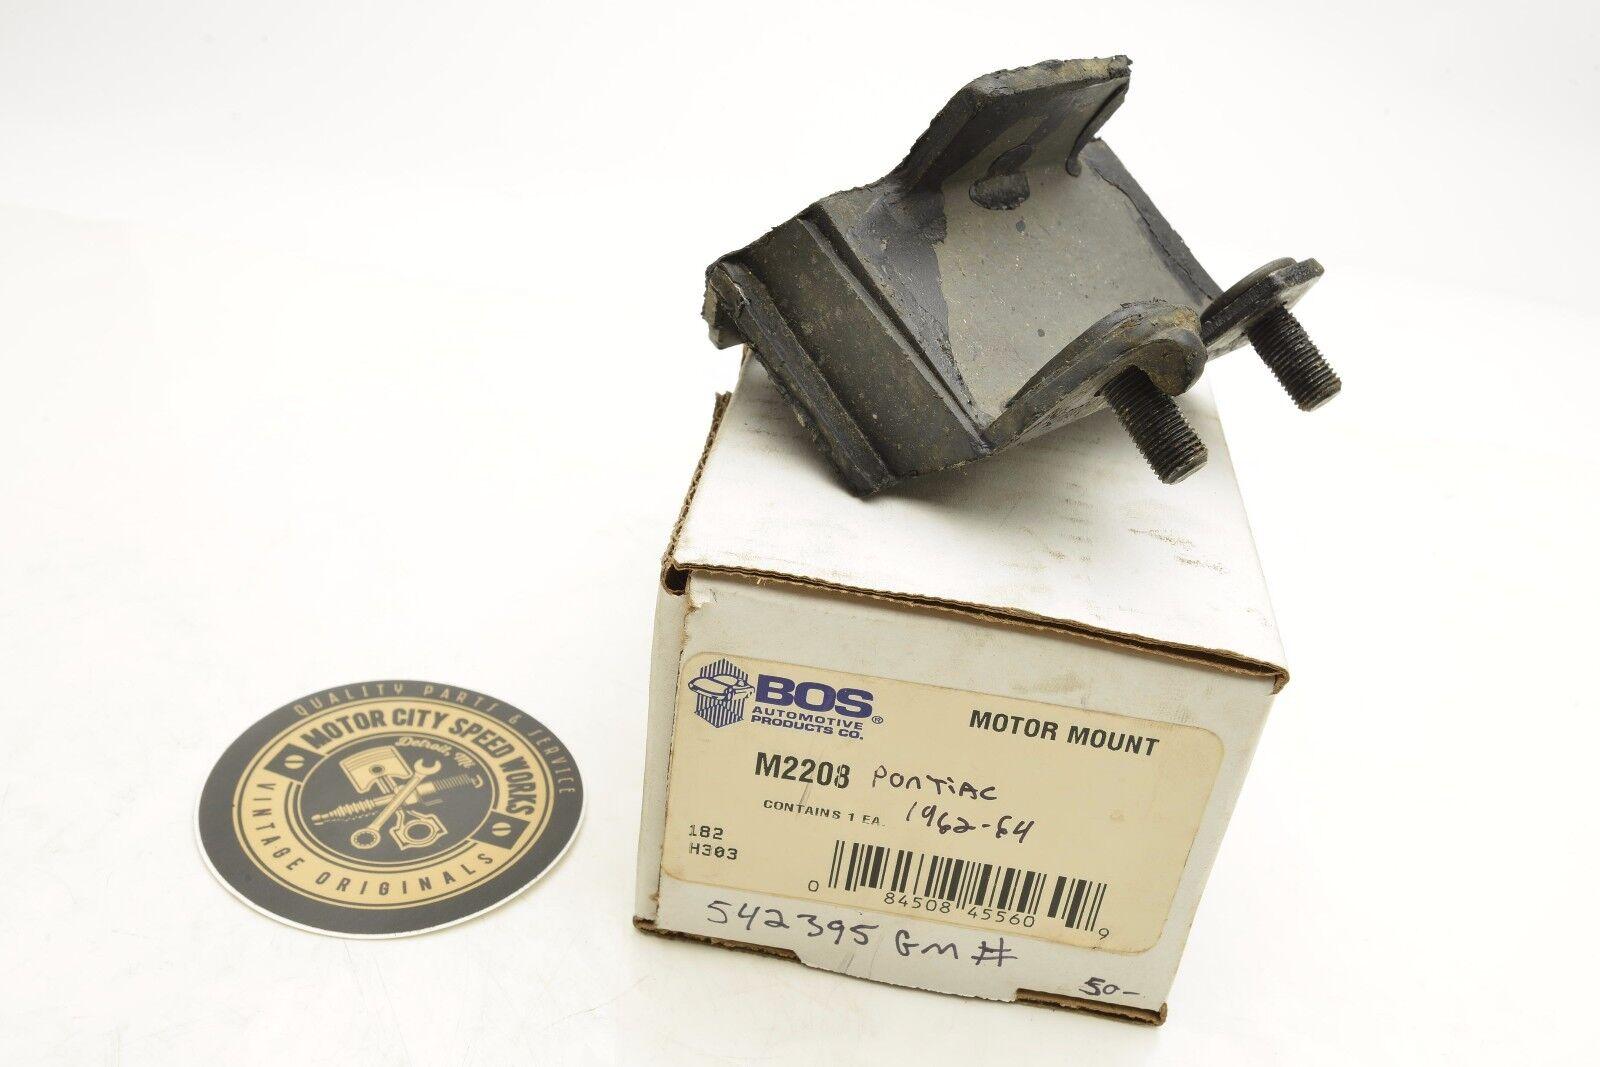 Pontiac 1962-64 Rear Motor Engine Mount NEW 542395